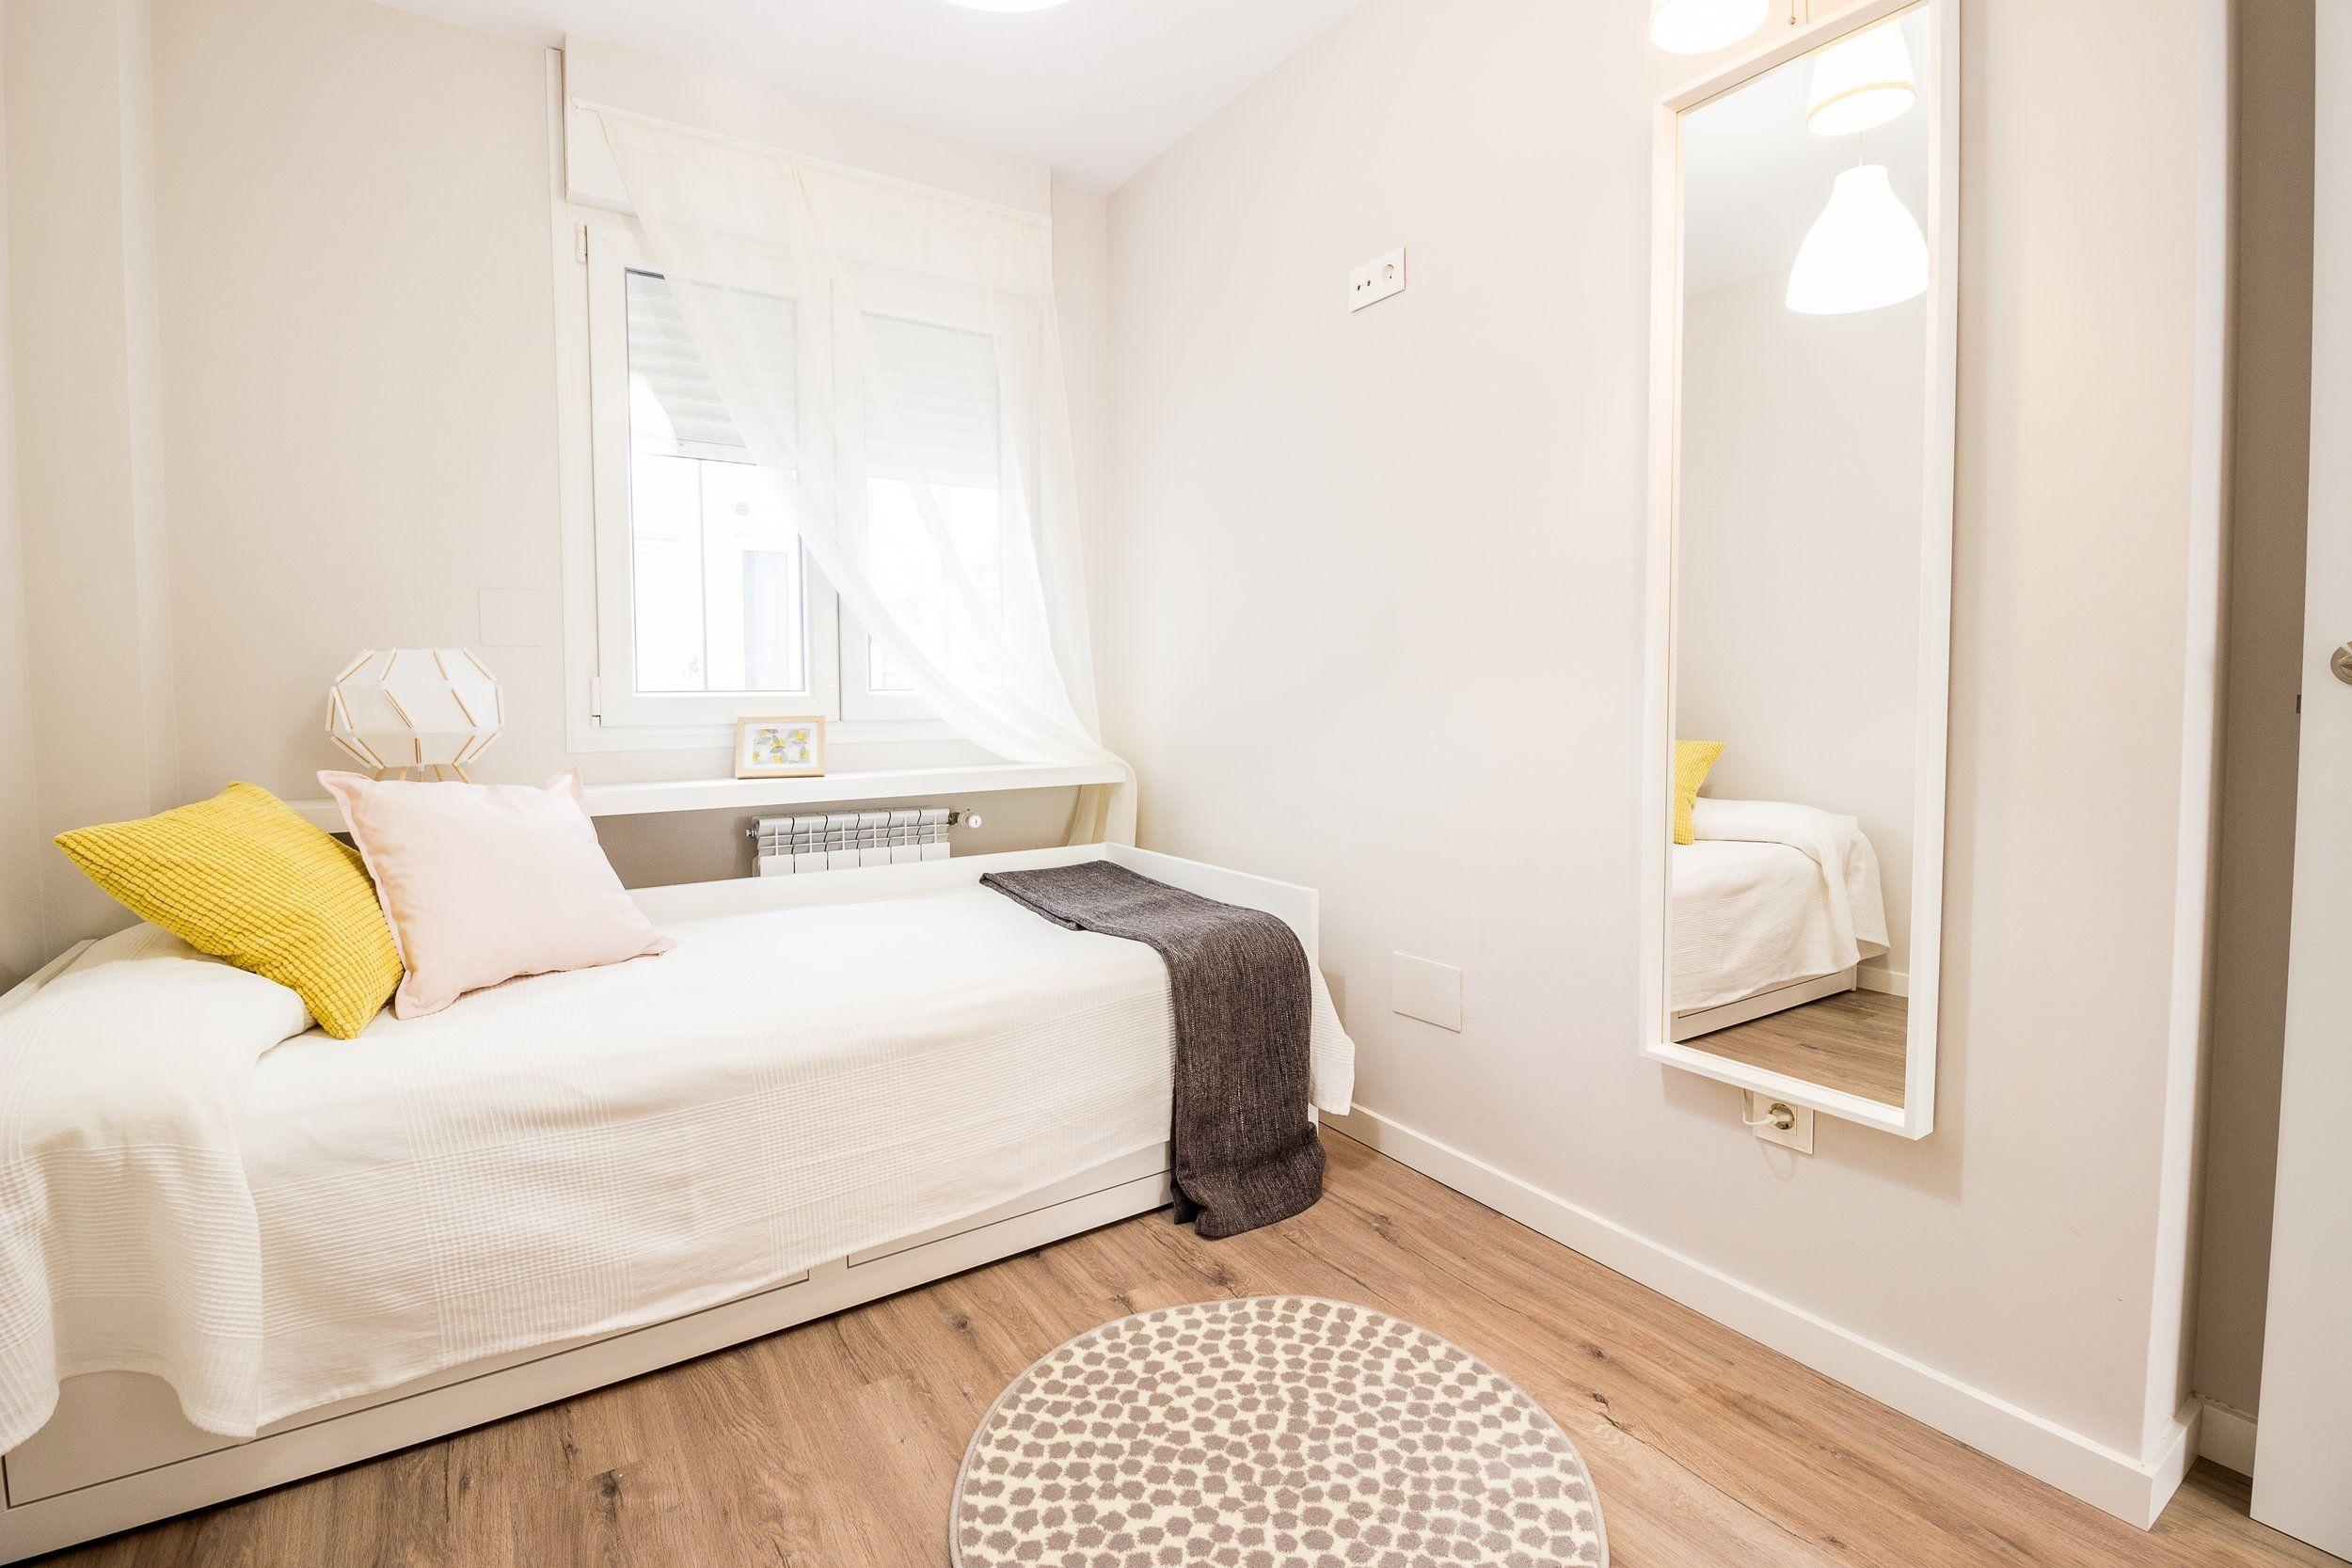 Astonishing Rental Apartment Decorating Ideas 44